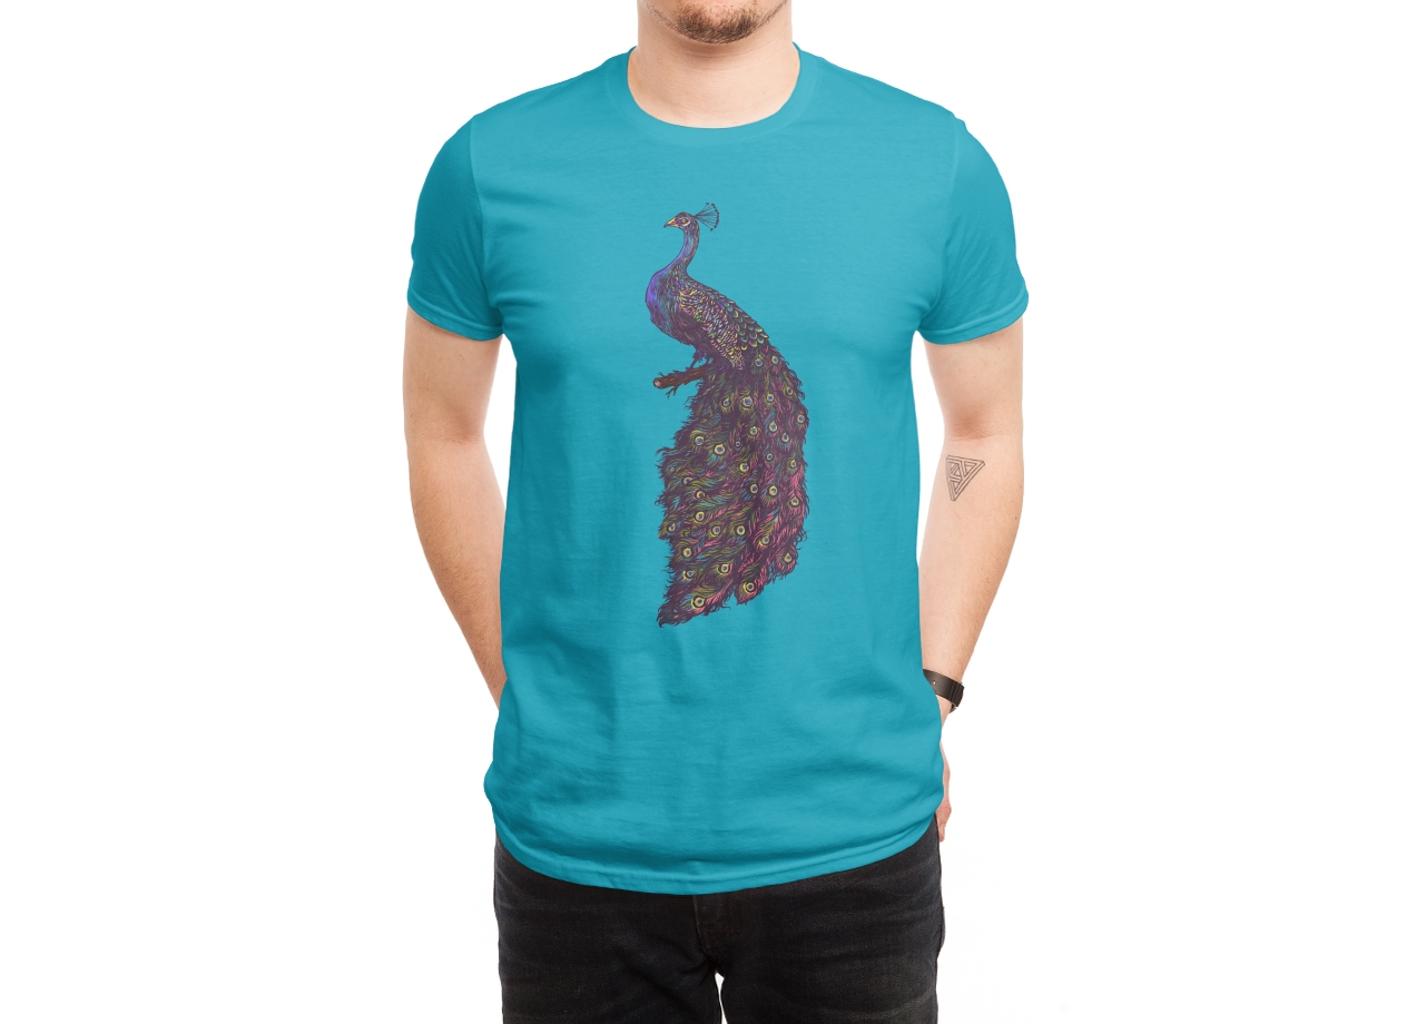 Threadless: Peacock